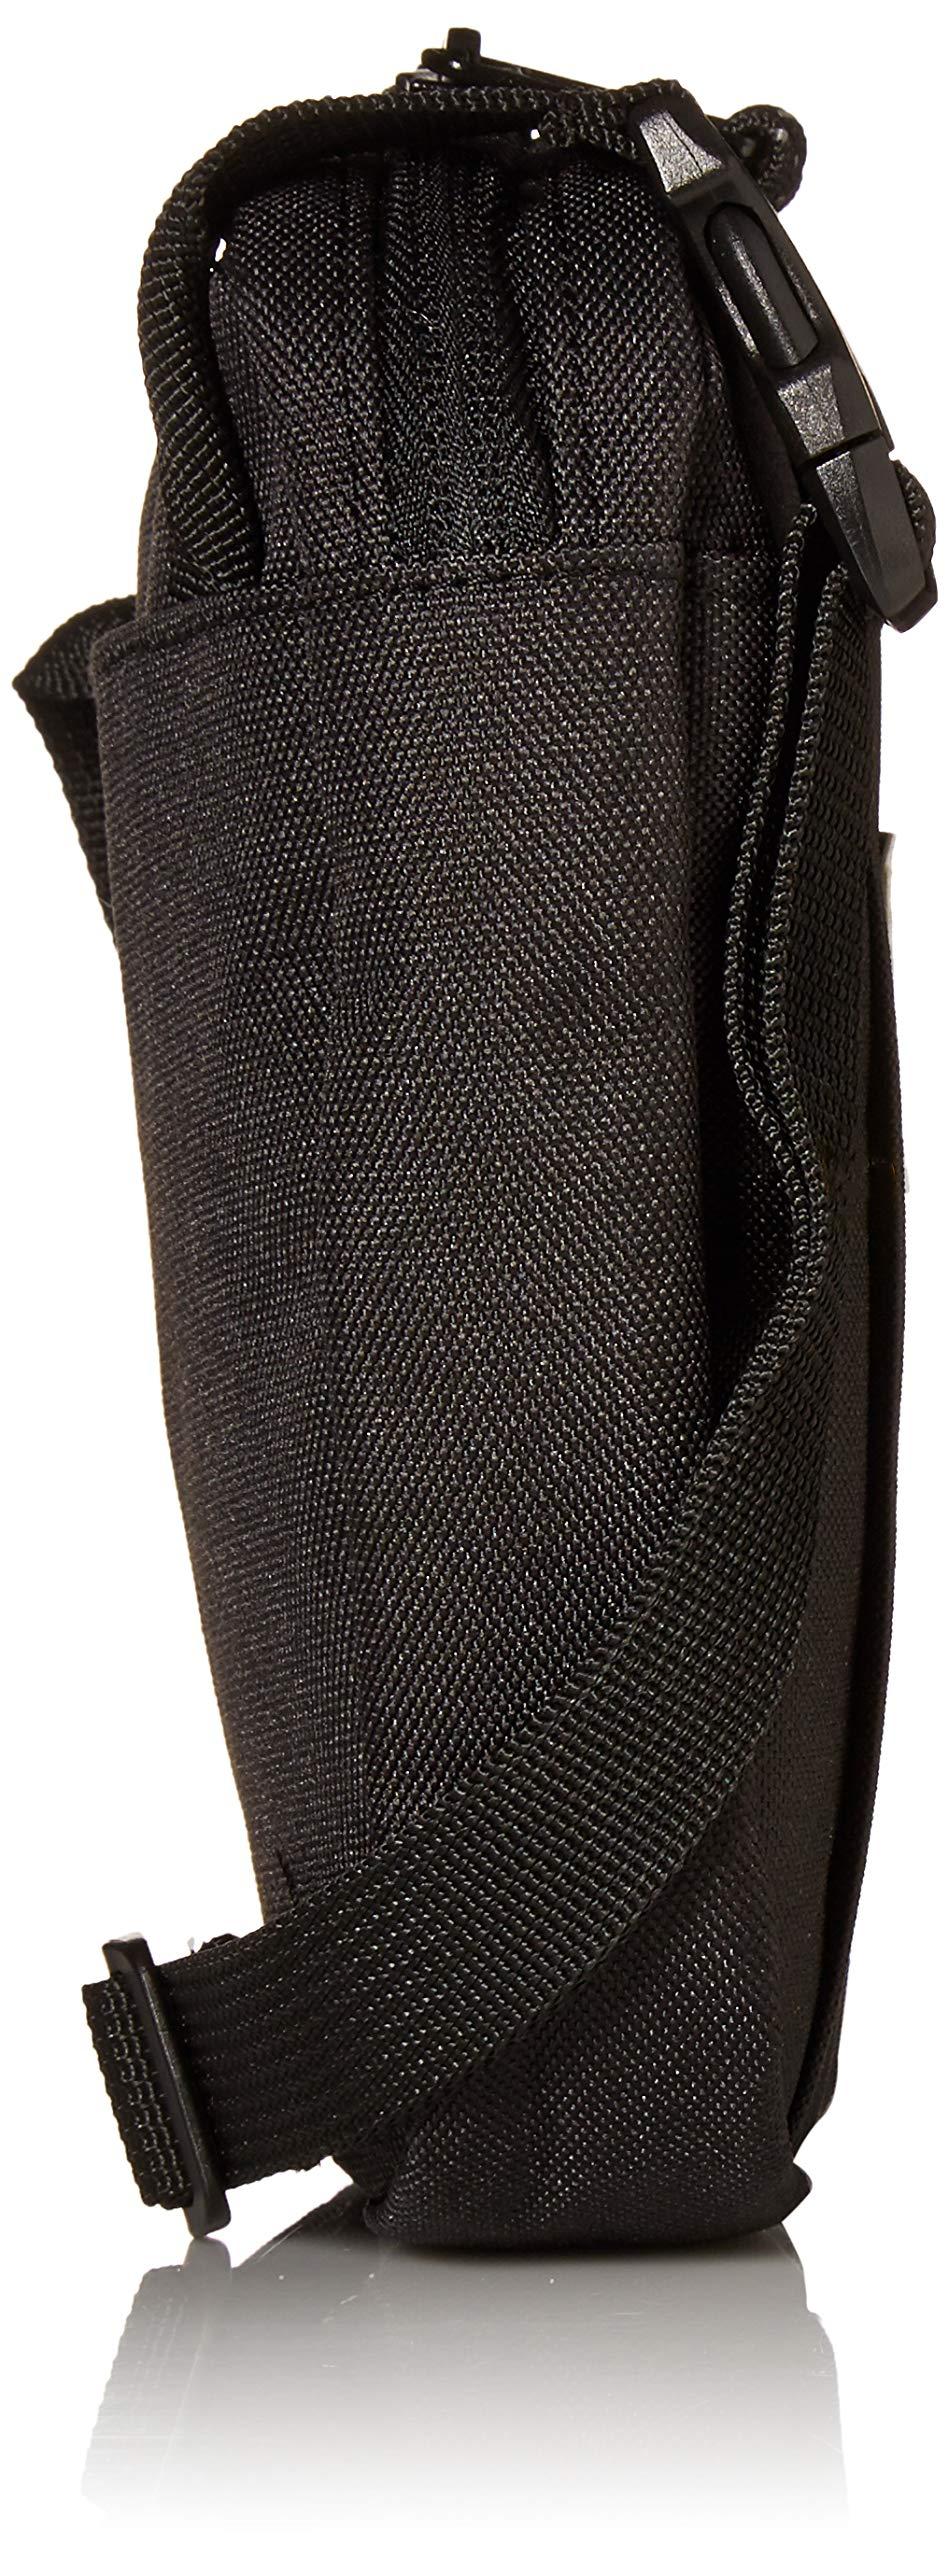 Herschel Cruz Cross Body Bag, Black, 0.5L